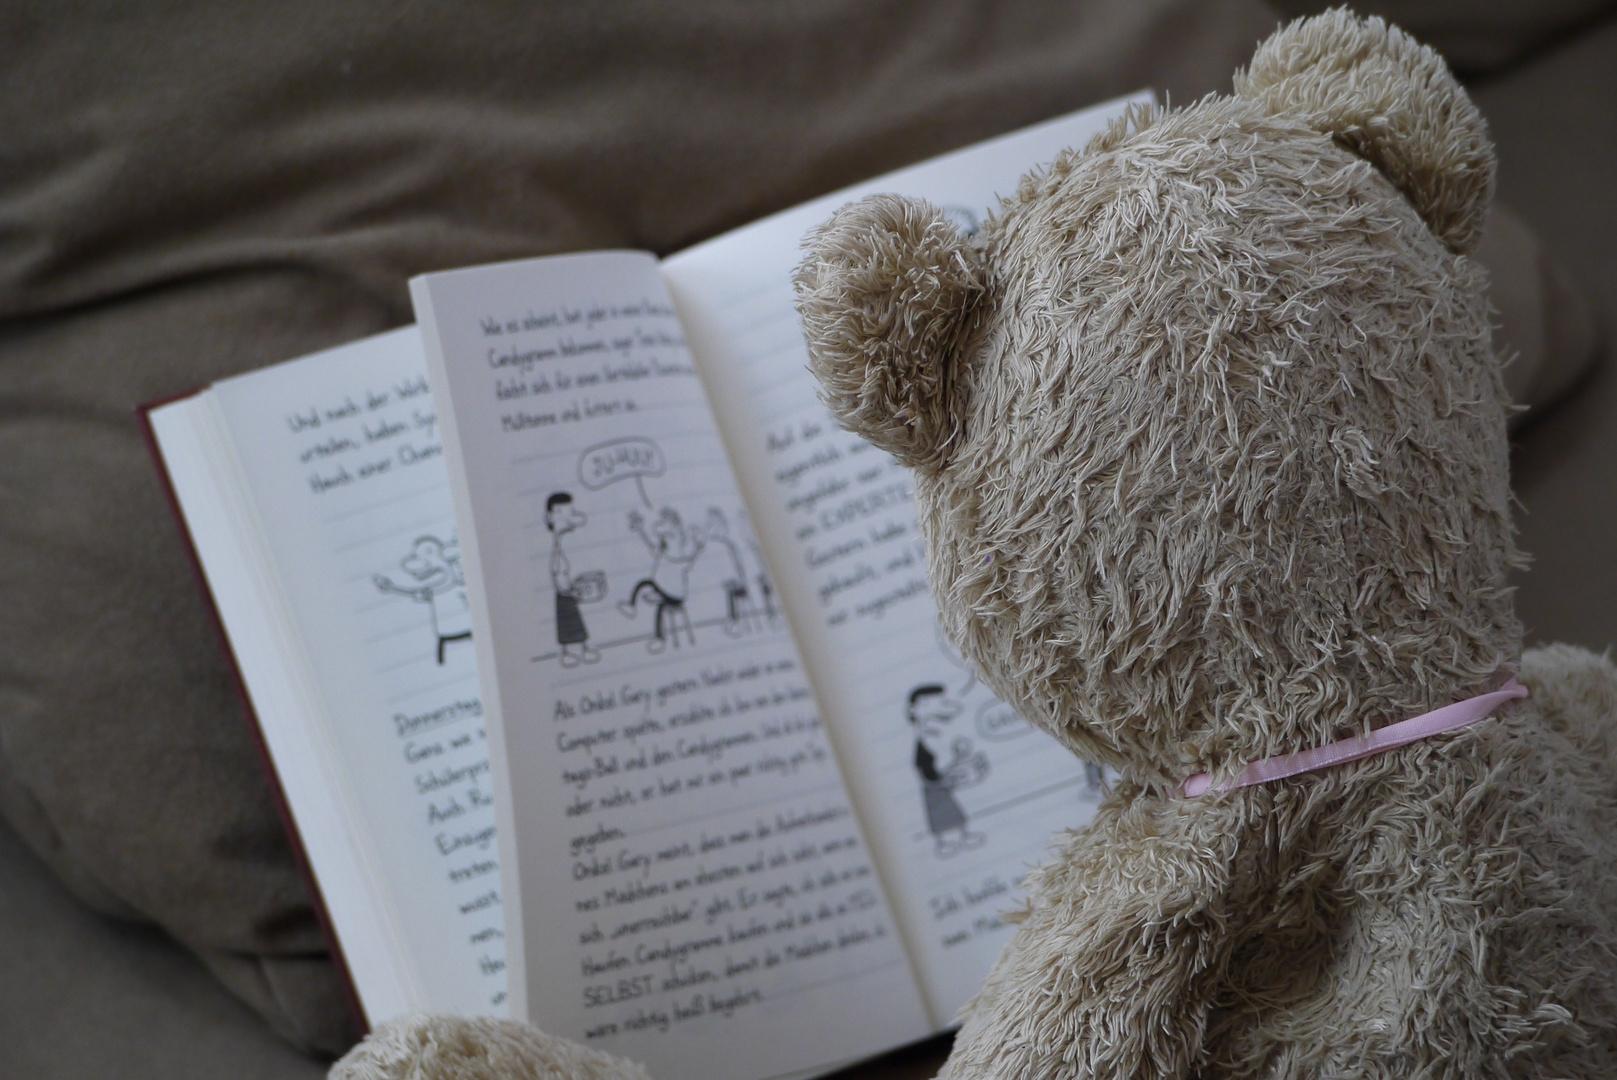 Teddy am lesen